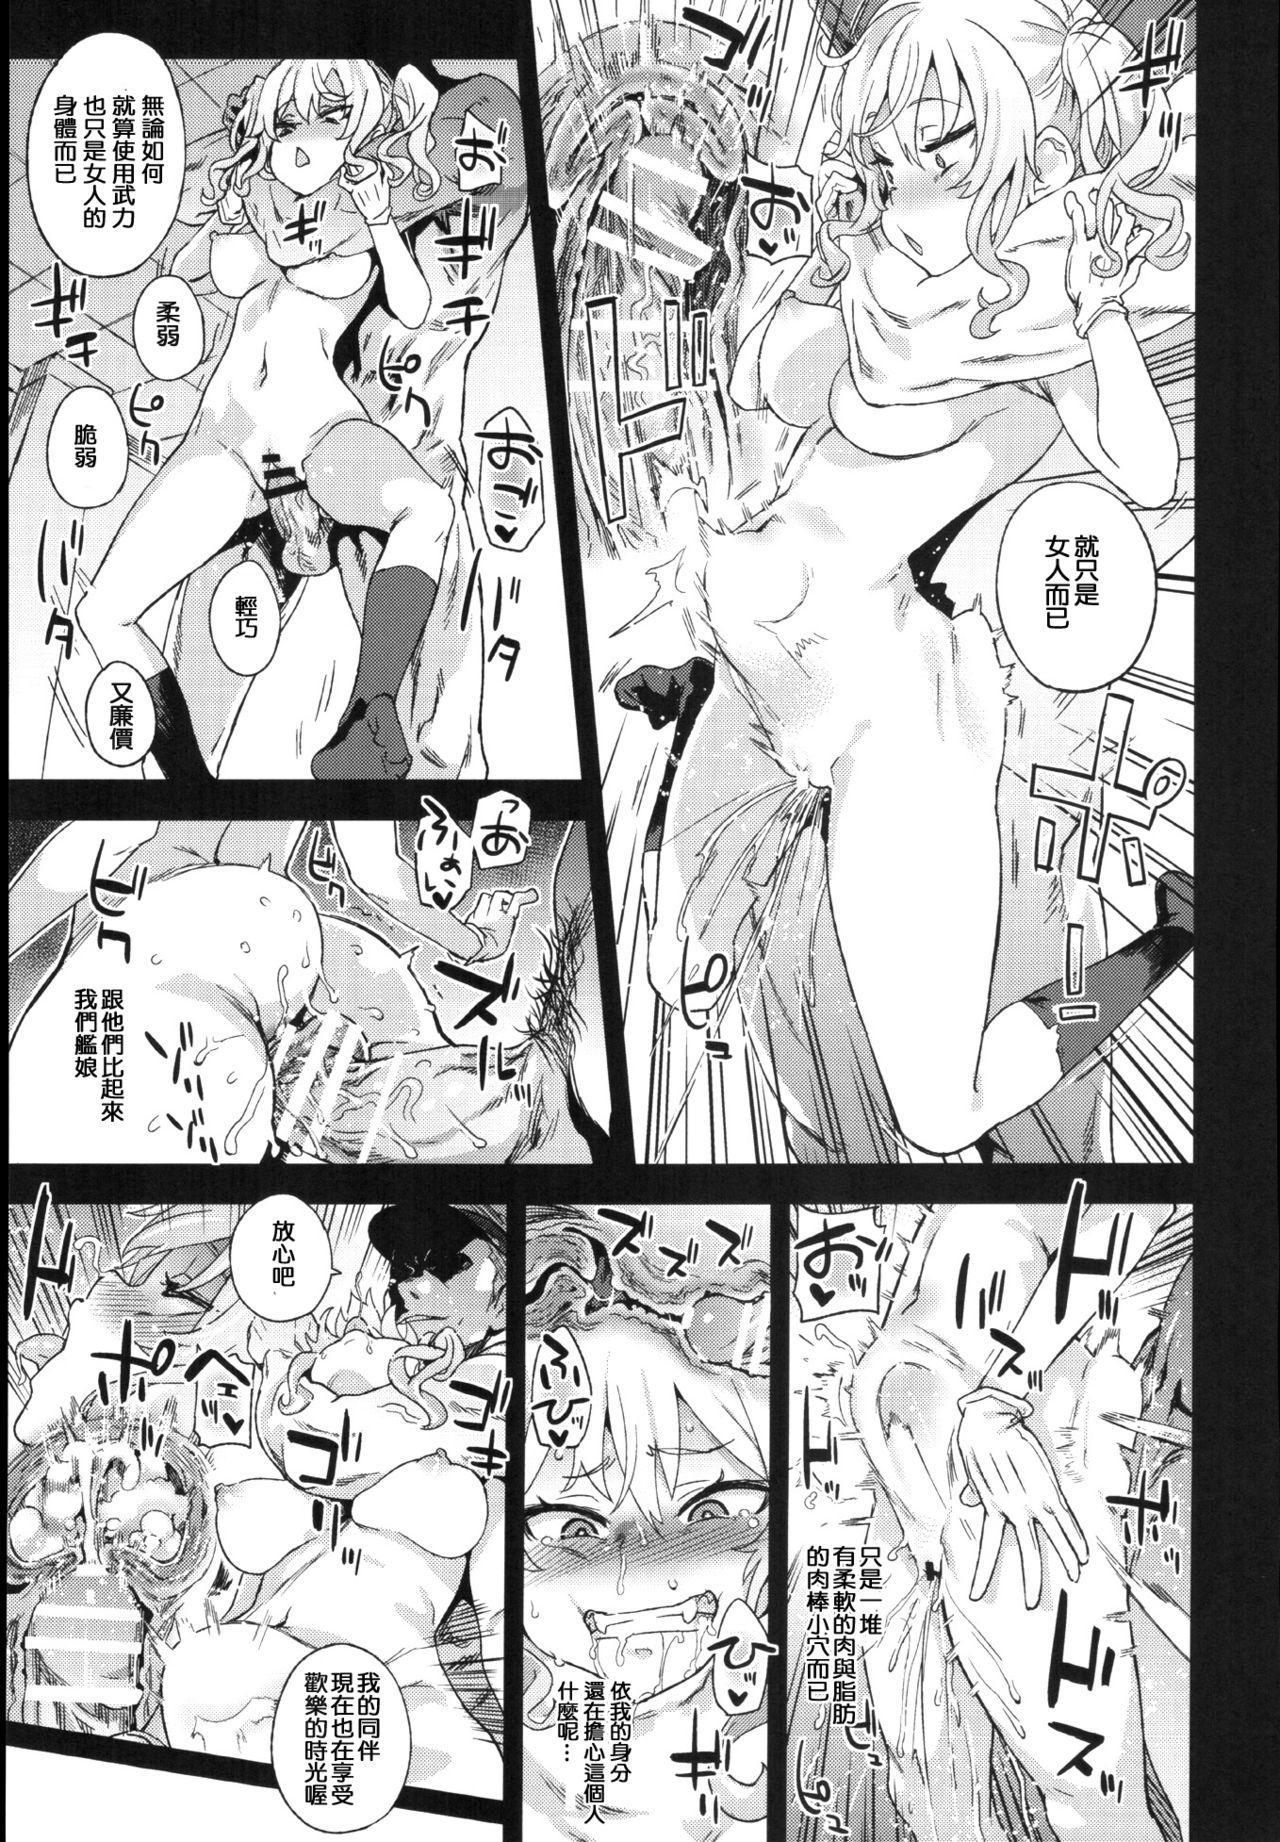 Victim Girls 22 Joou Kashima no Choukyou Nisshi 25